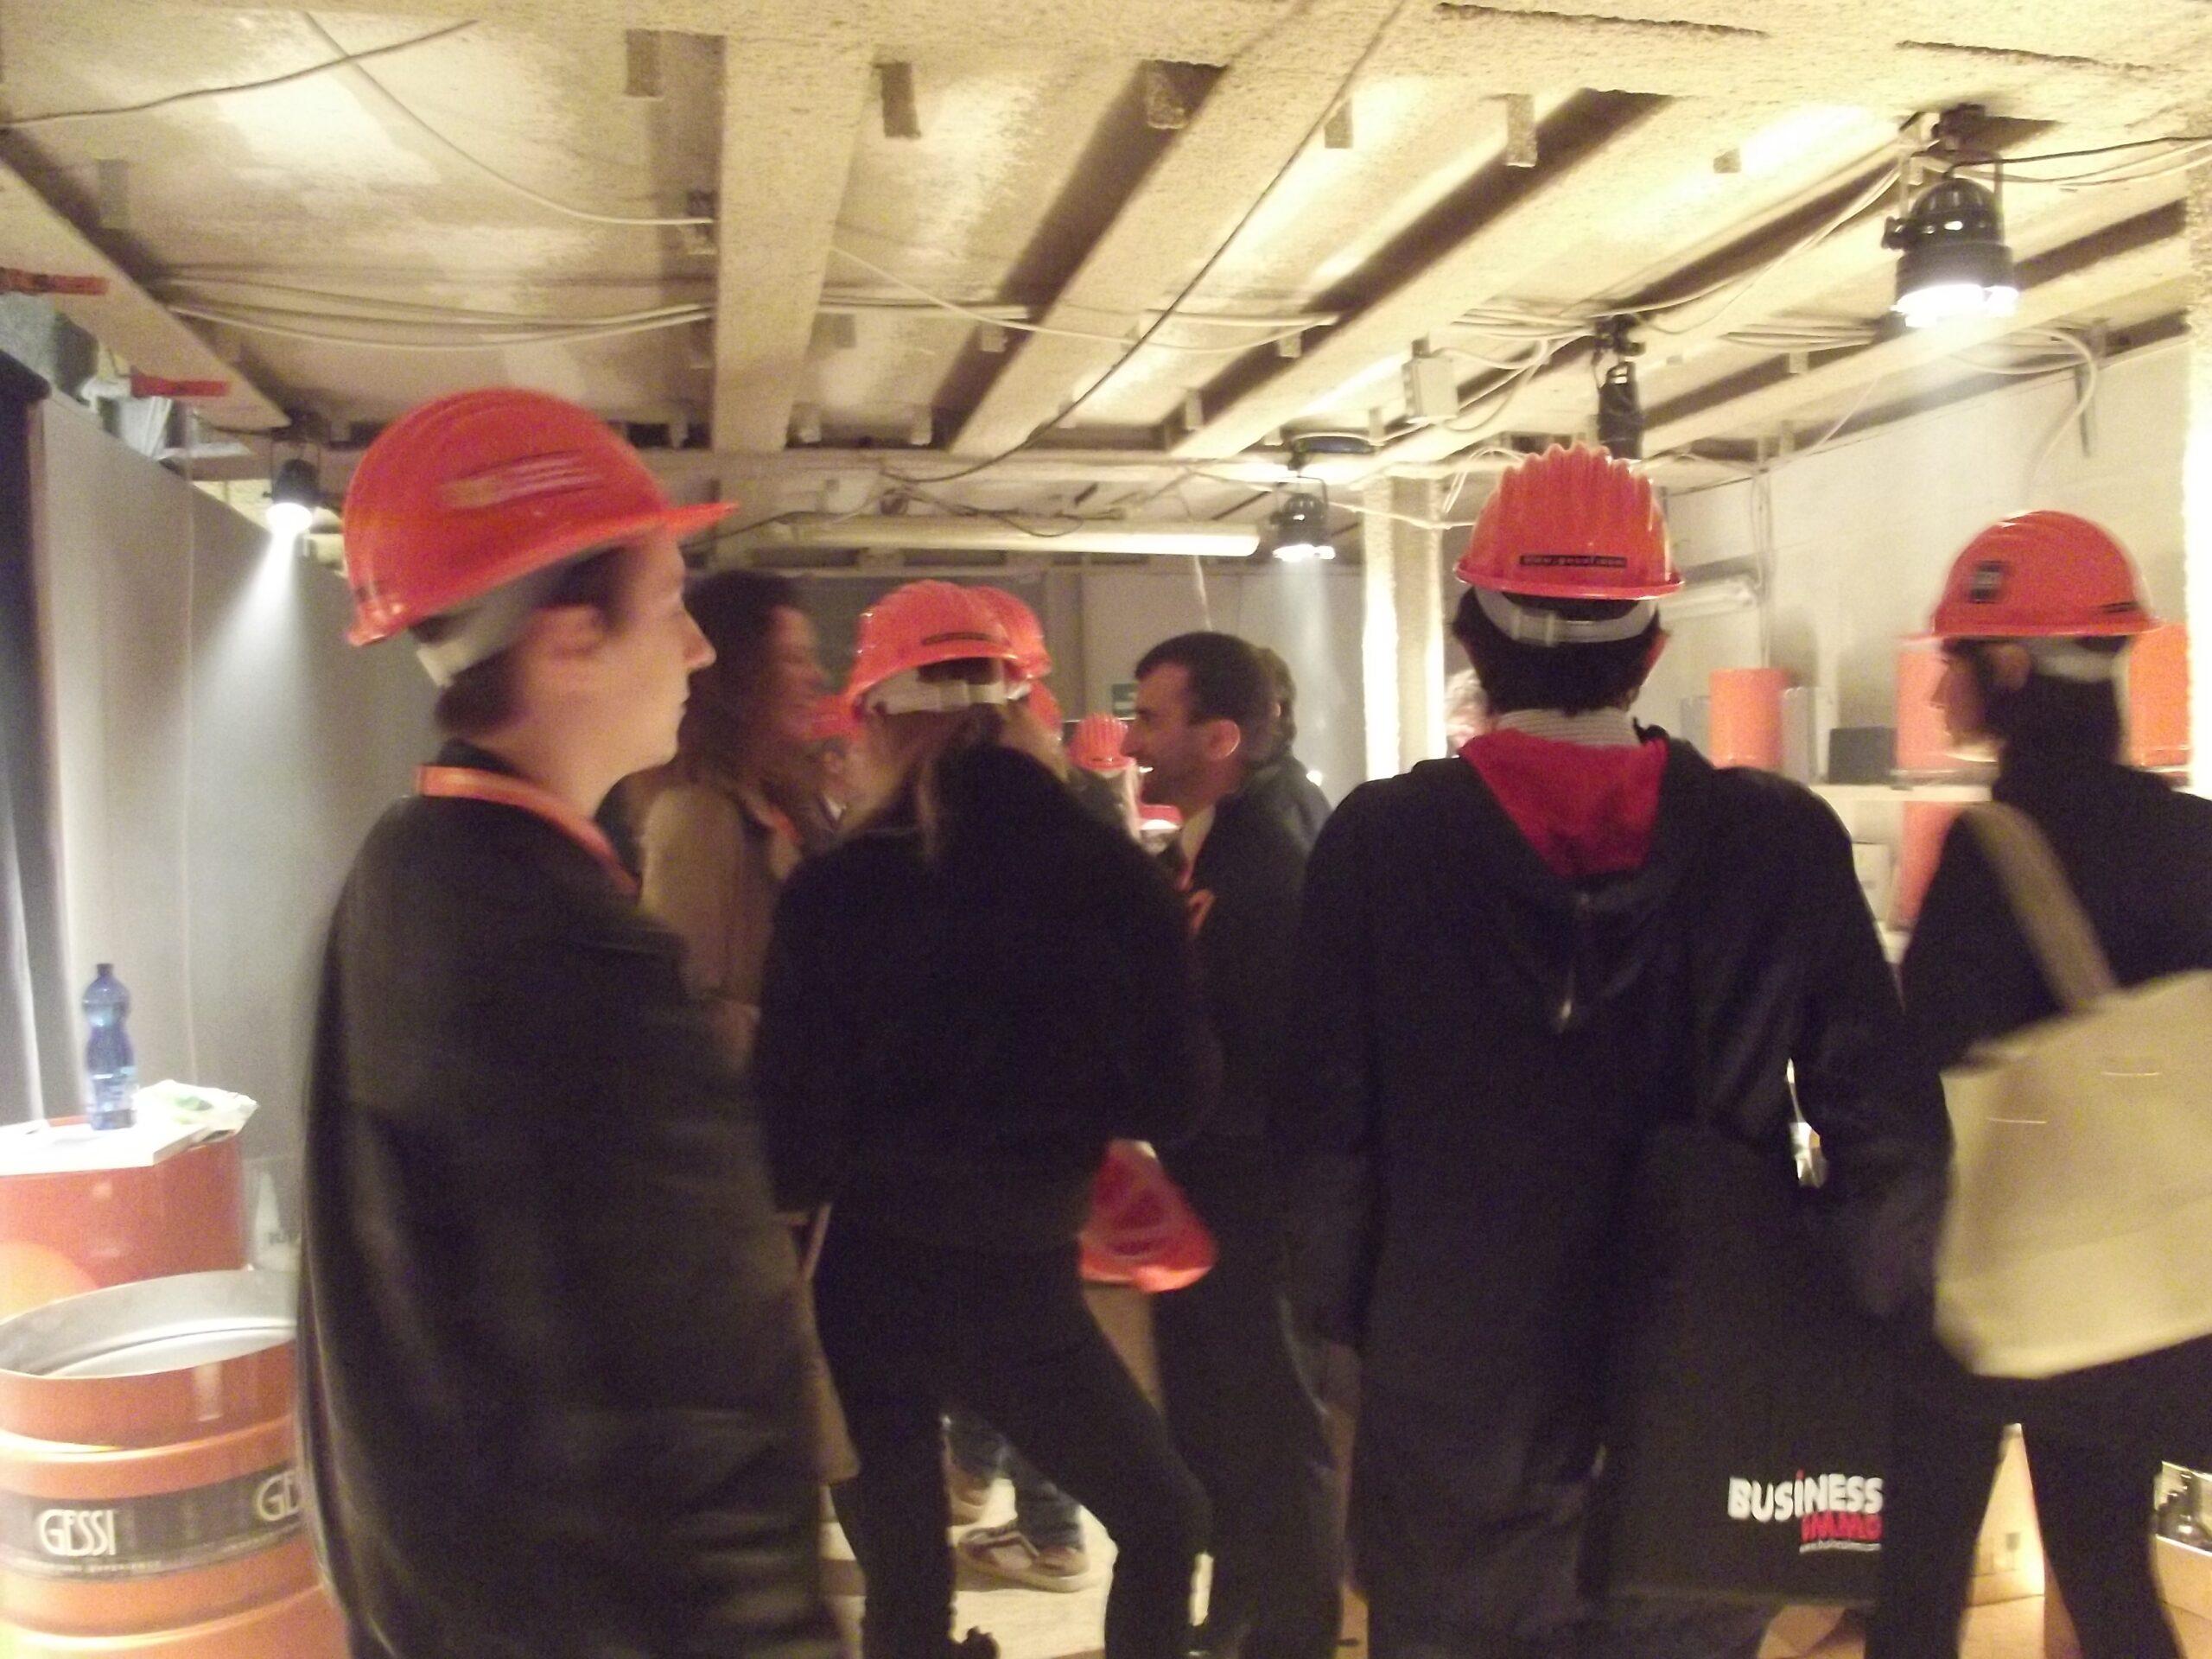 Fuorisalone 2012: Gessi Underground Experience